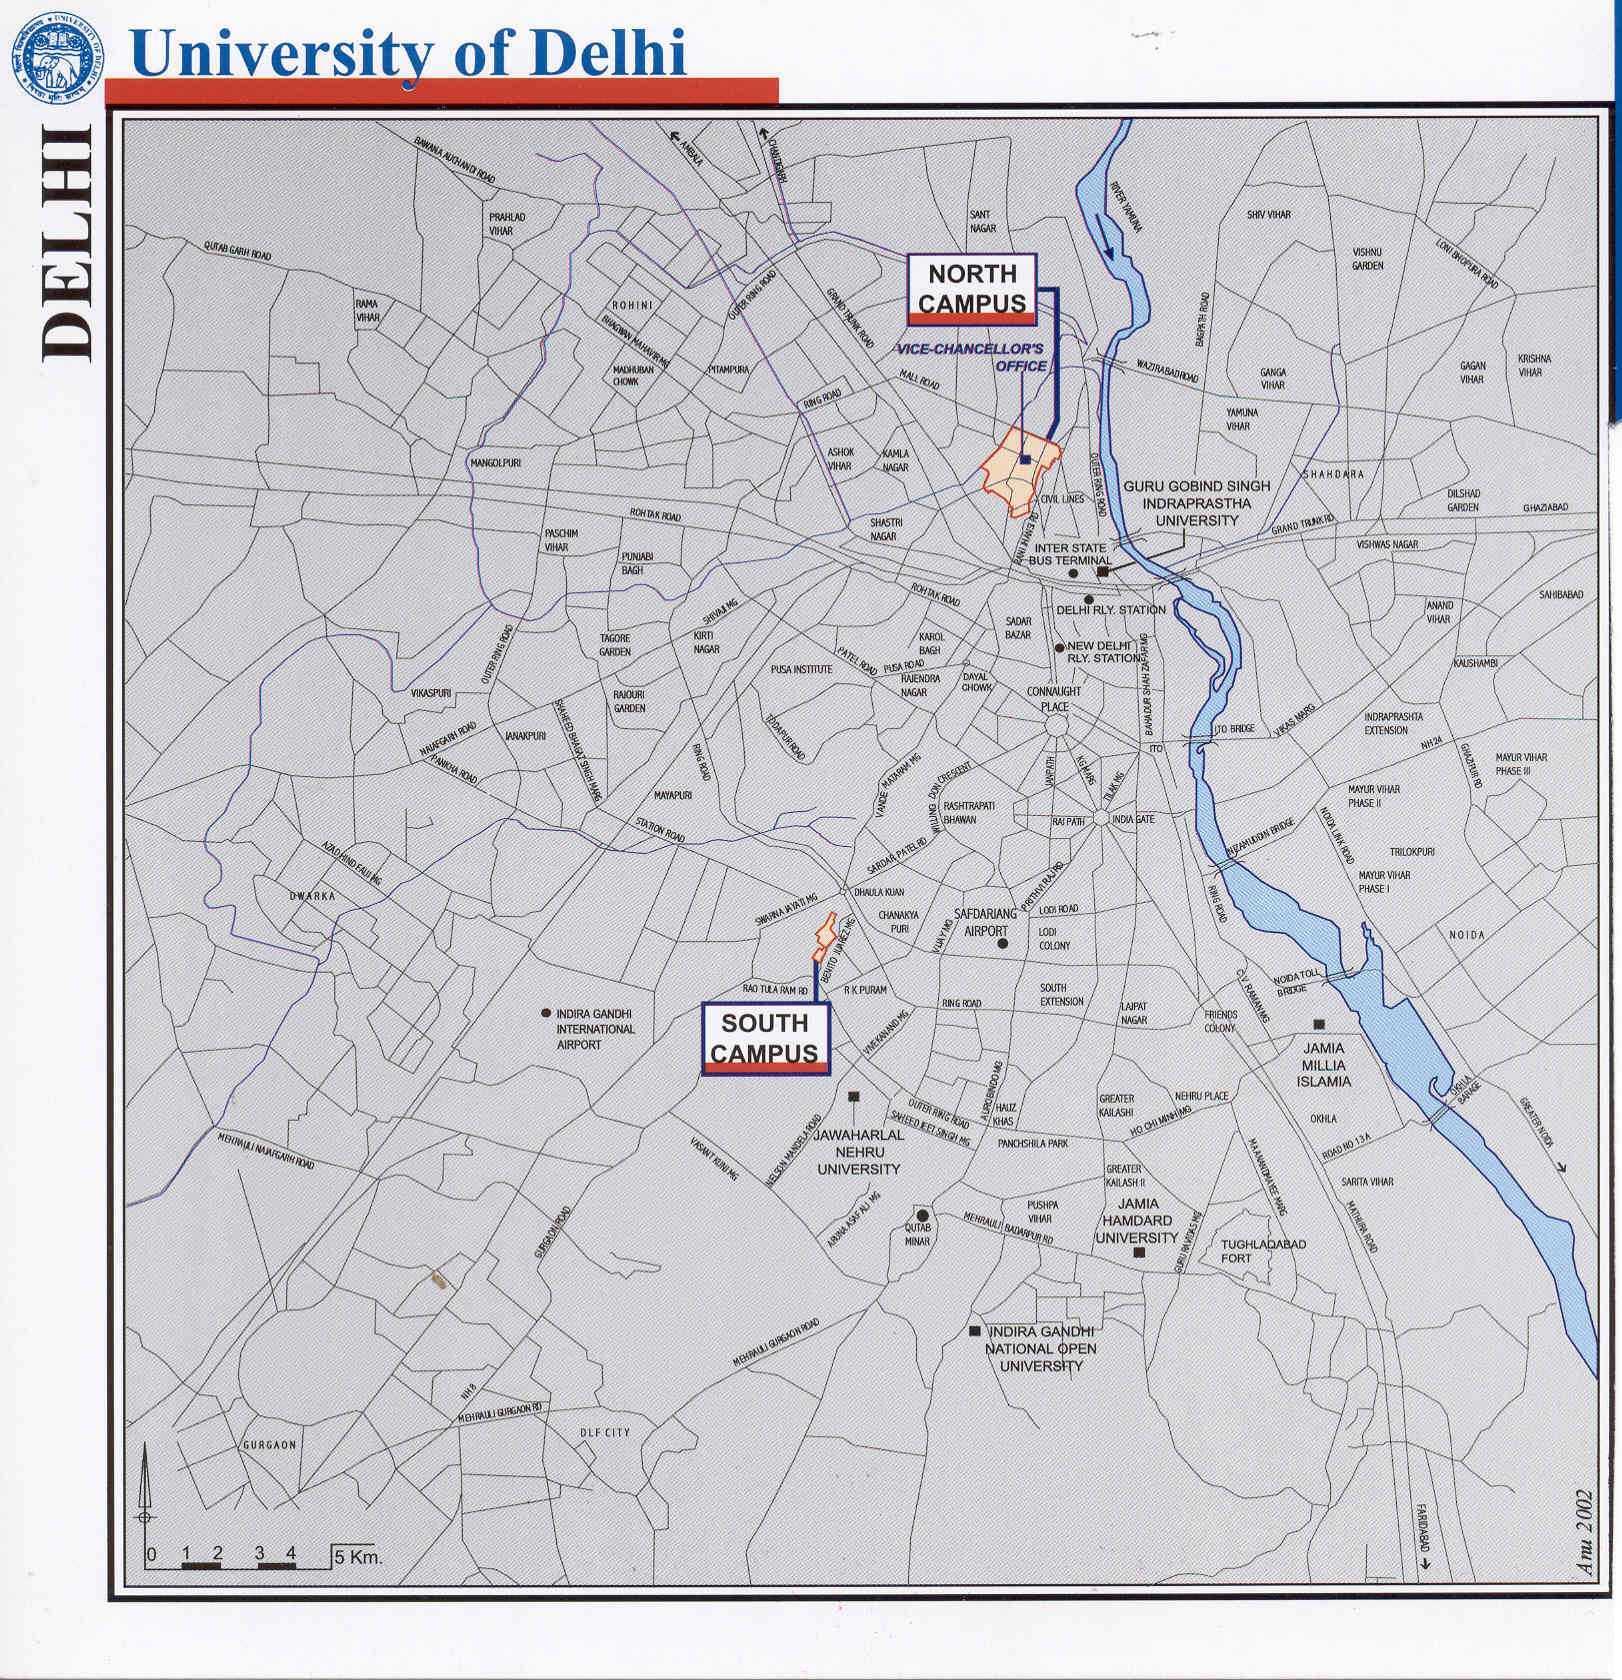 Delhi University North Campus and South Campus location